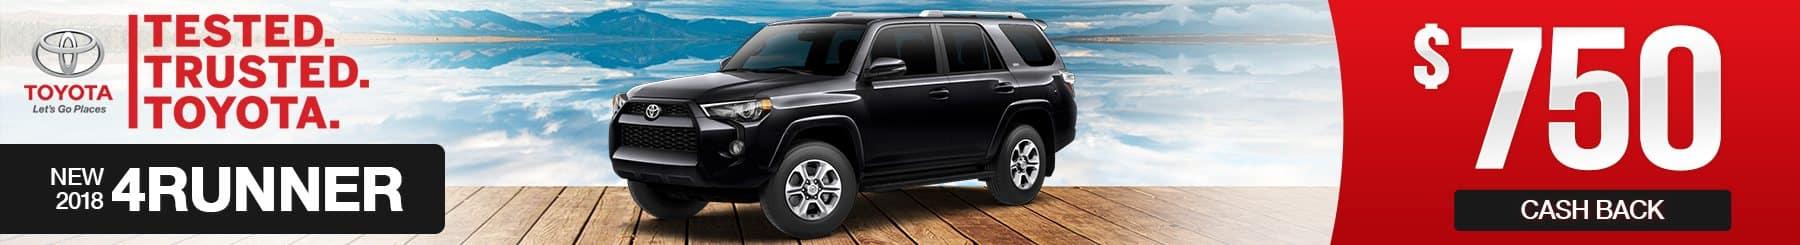 Toyota-4Runner-Cash-Back-Special